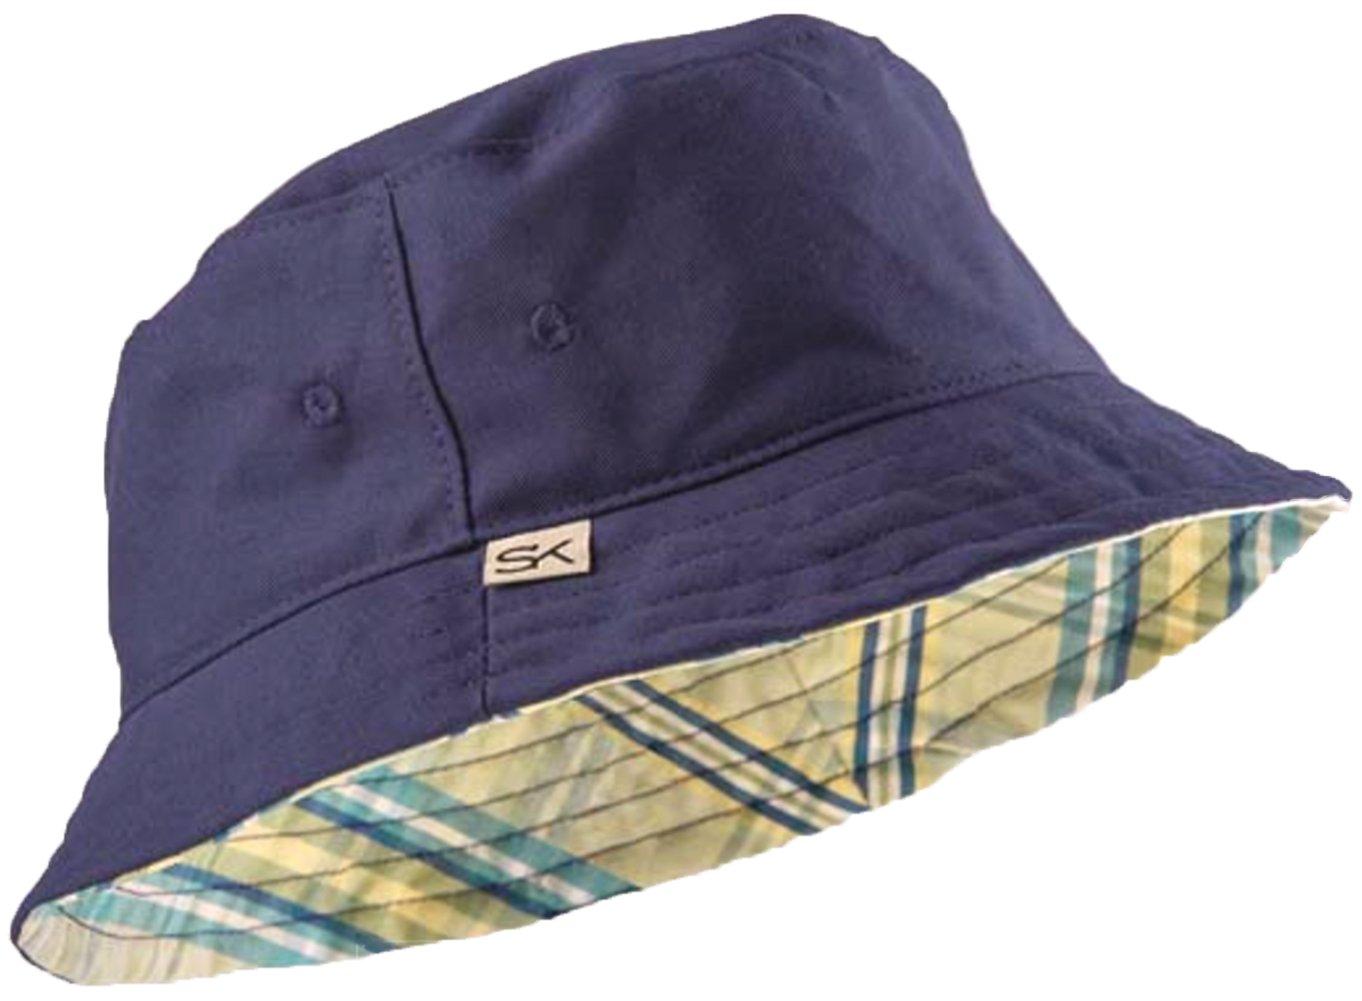 Stormy Kromer Unisex Bucket Hat, Eclipse, S by Stormy Kromer (Image #1)